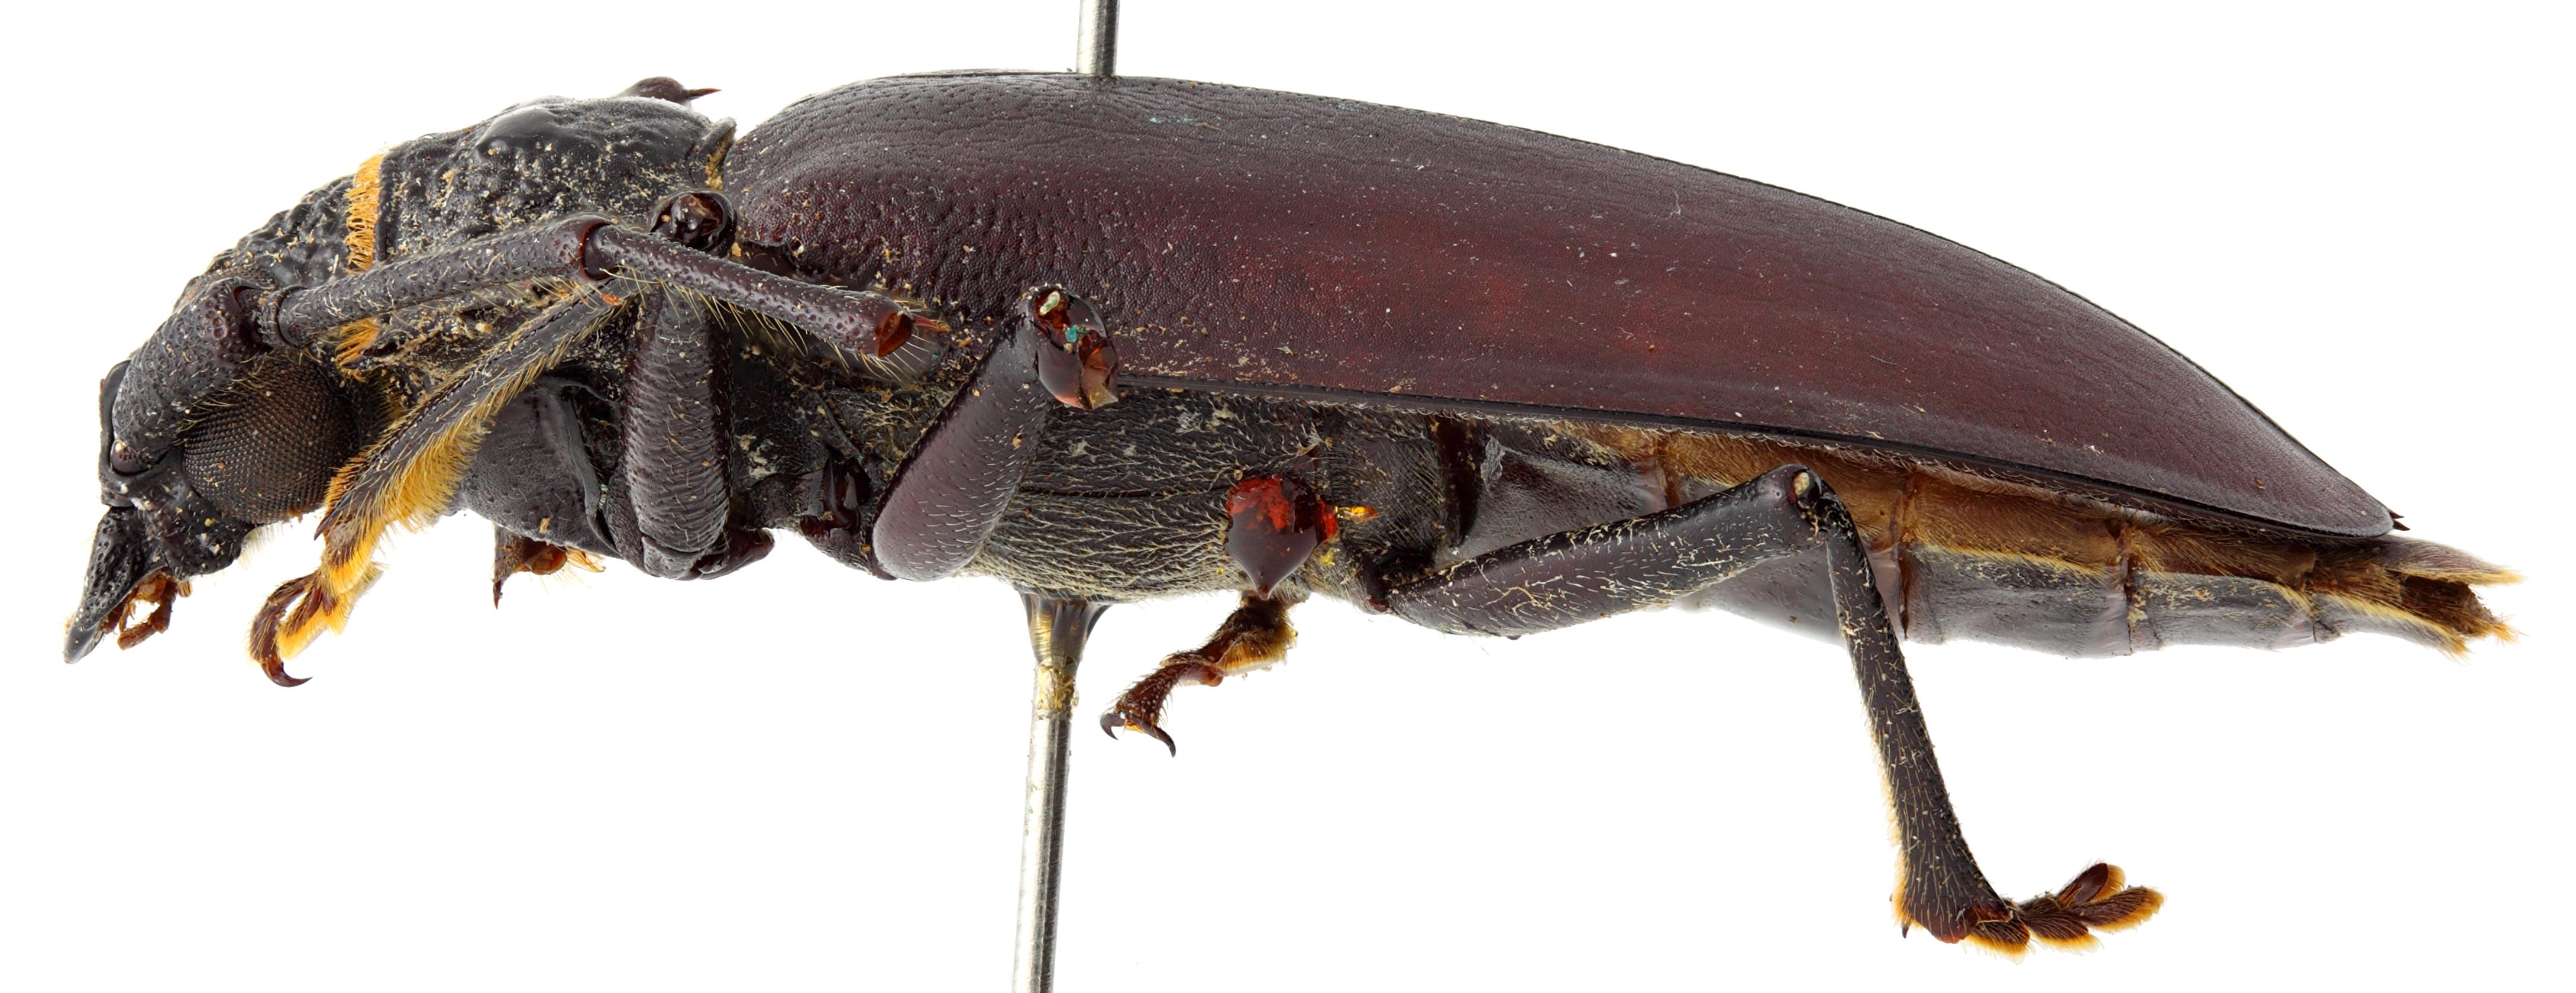 Hoploderes intermedius 05 BL Holotype M 044 BRUS 201405.jpg